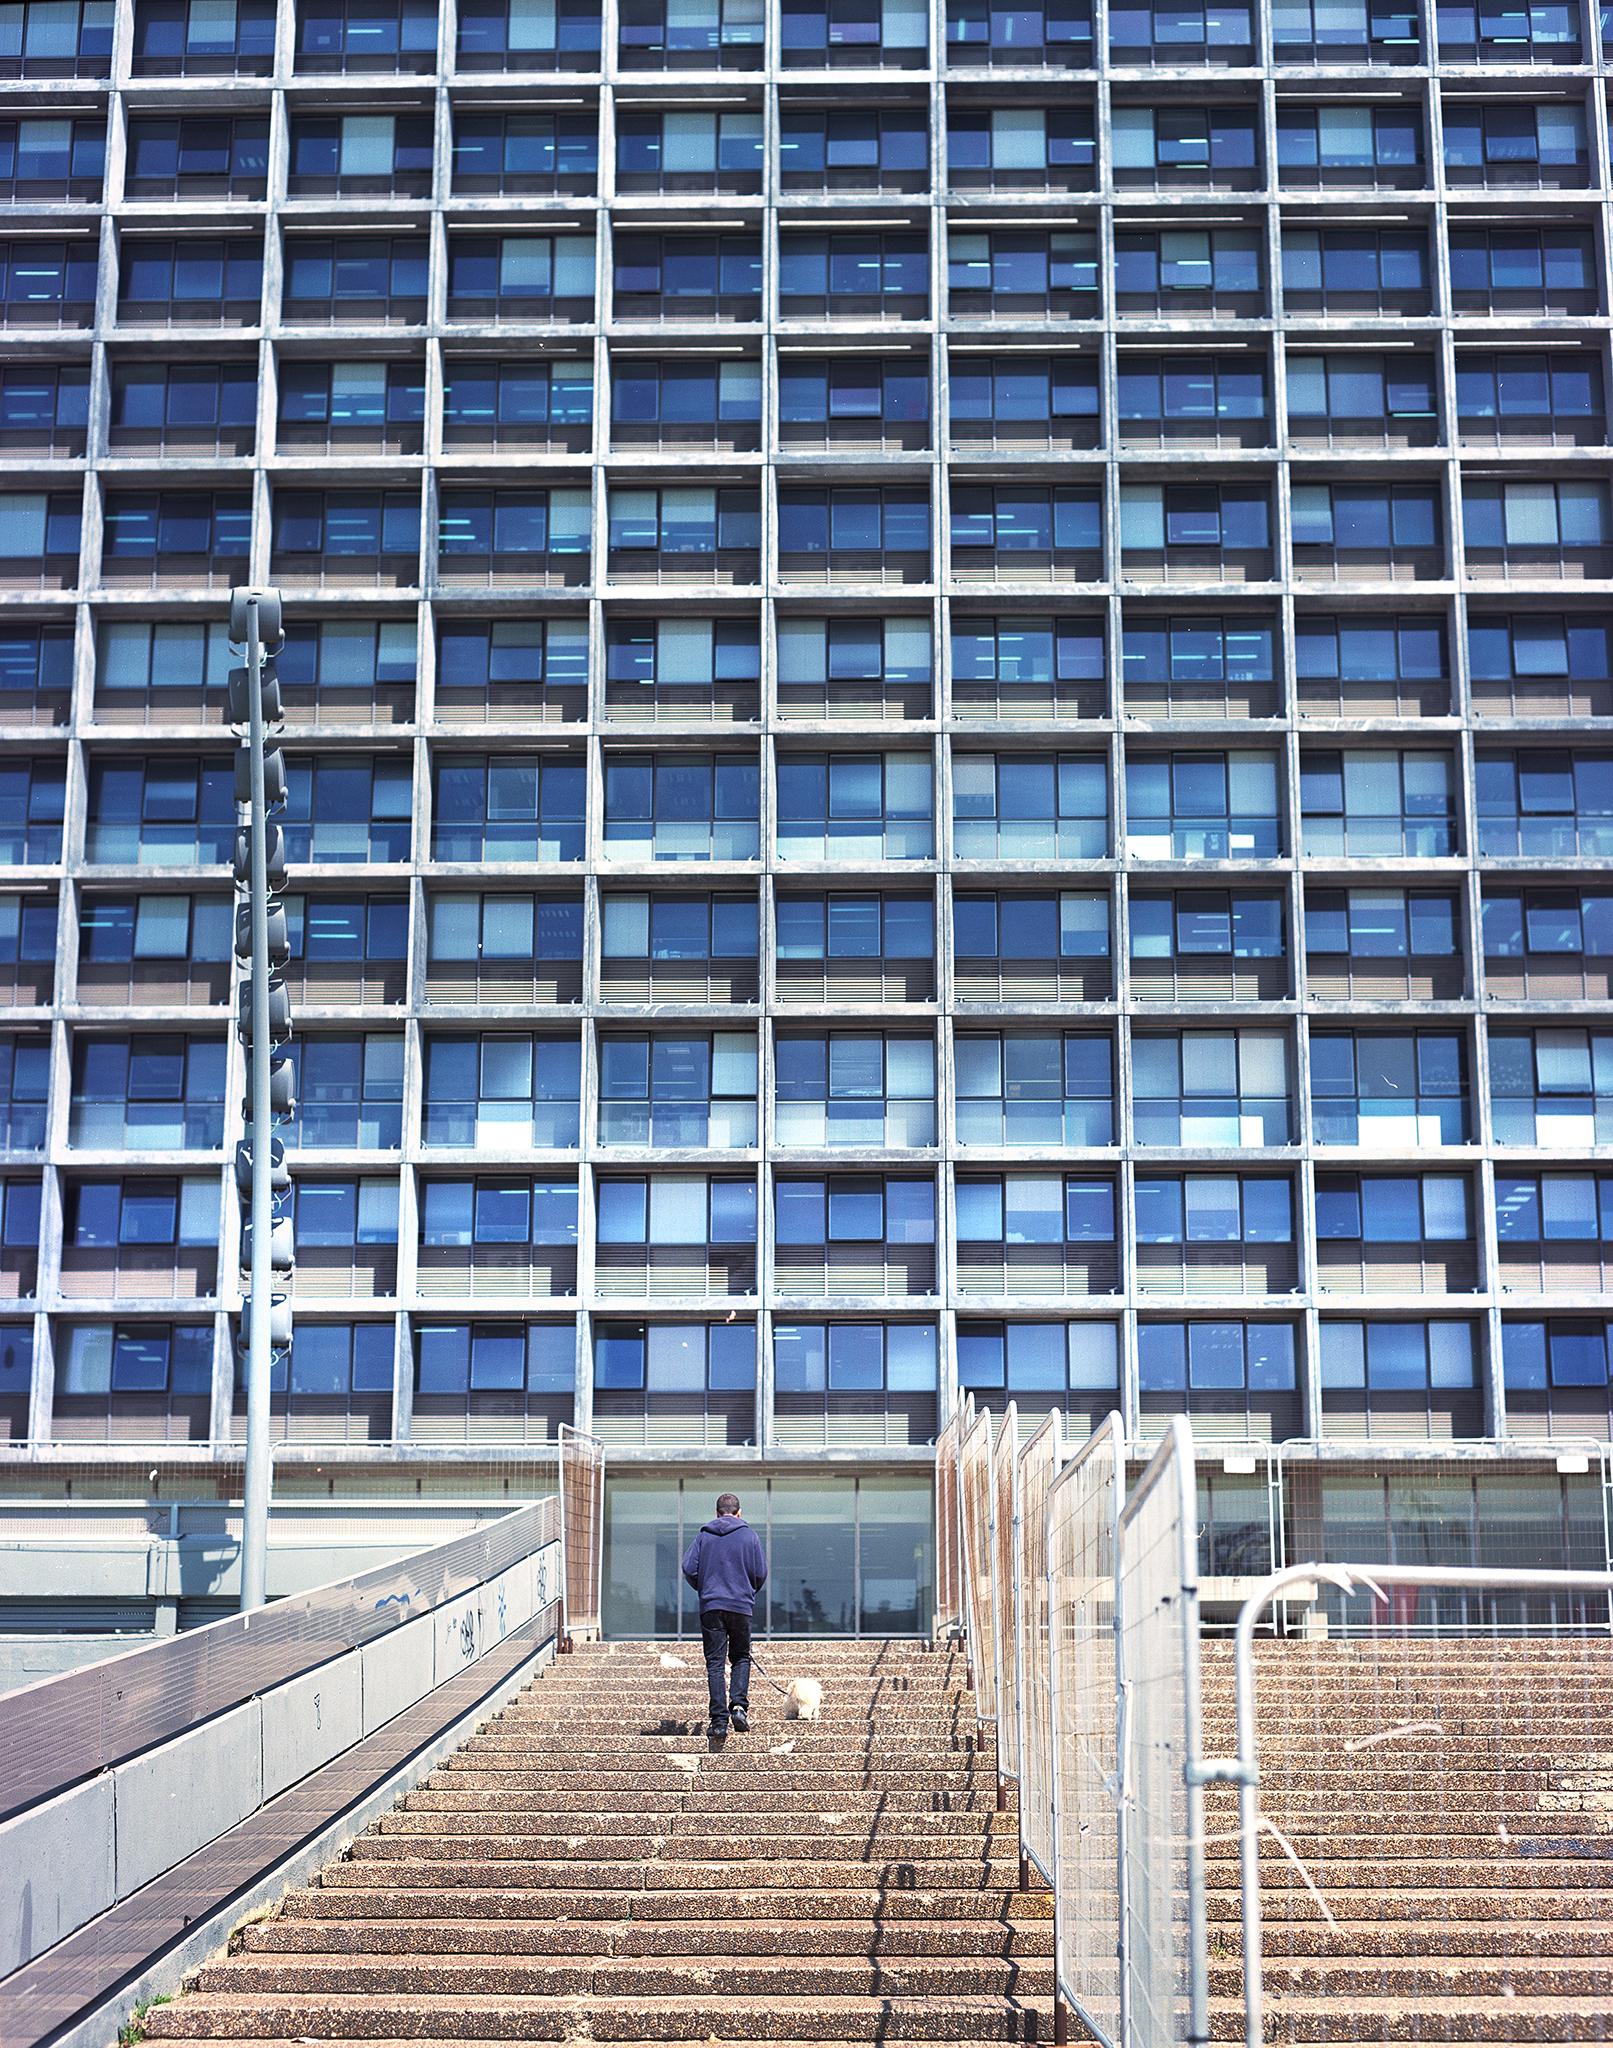 Man ascending stairs kikar rabin copy.jpg